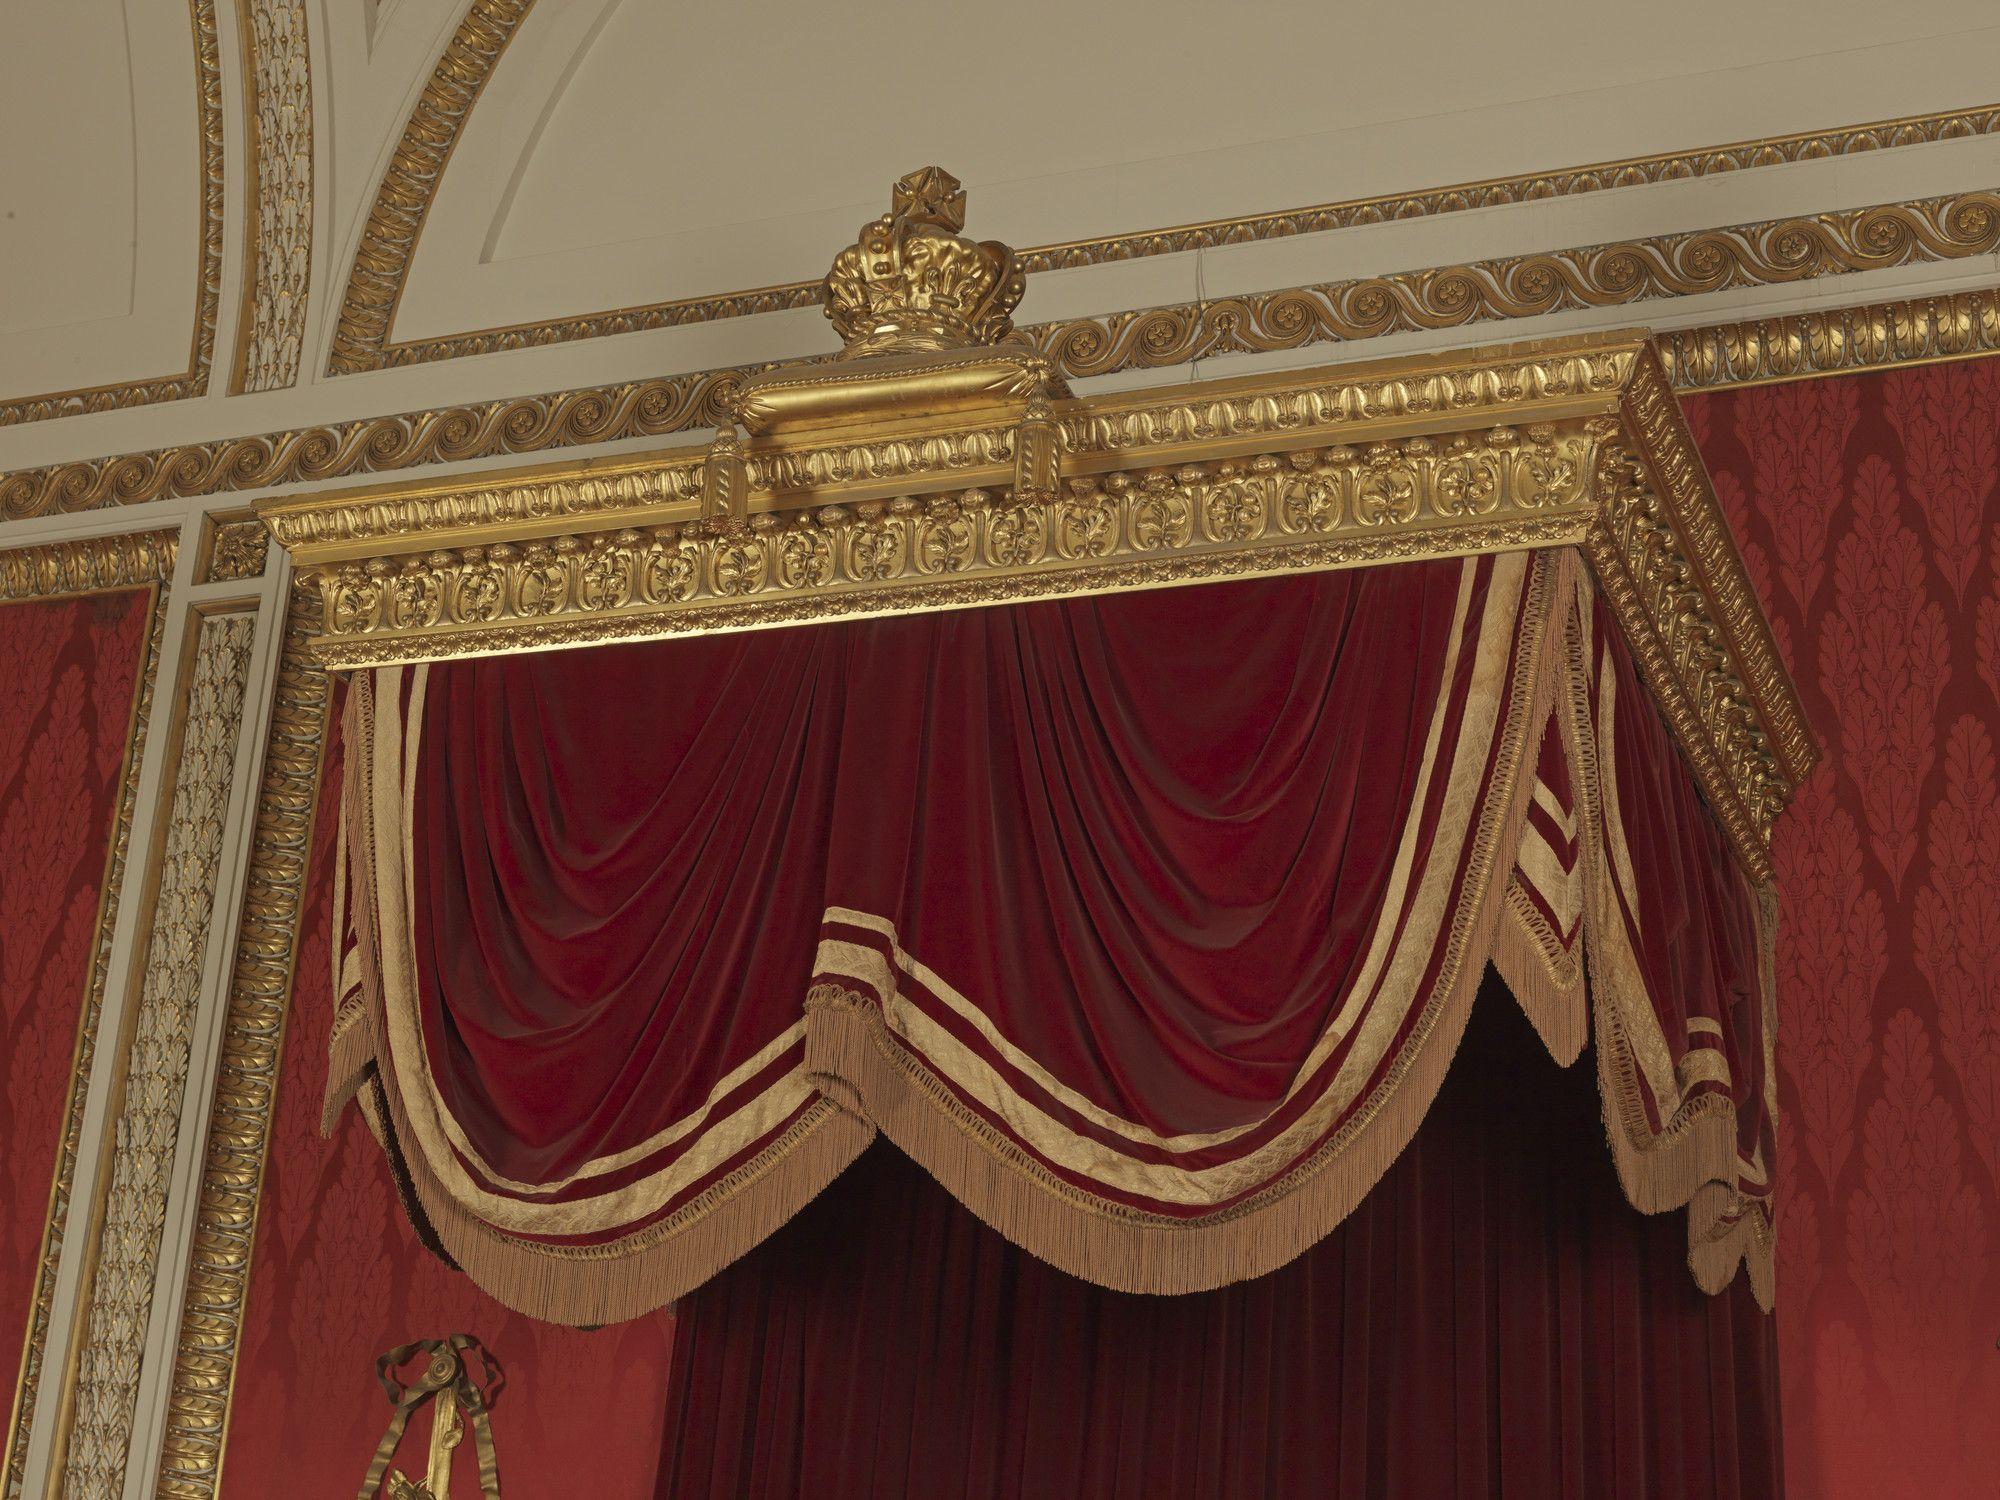 Throne canopy & Throne canopy | Buckingham Palace | Pinterest | Canopy Buckingham ...